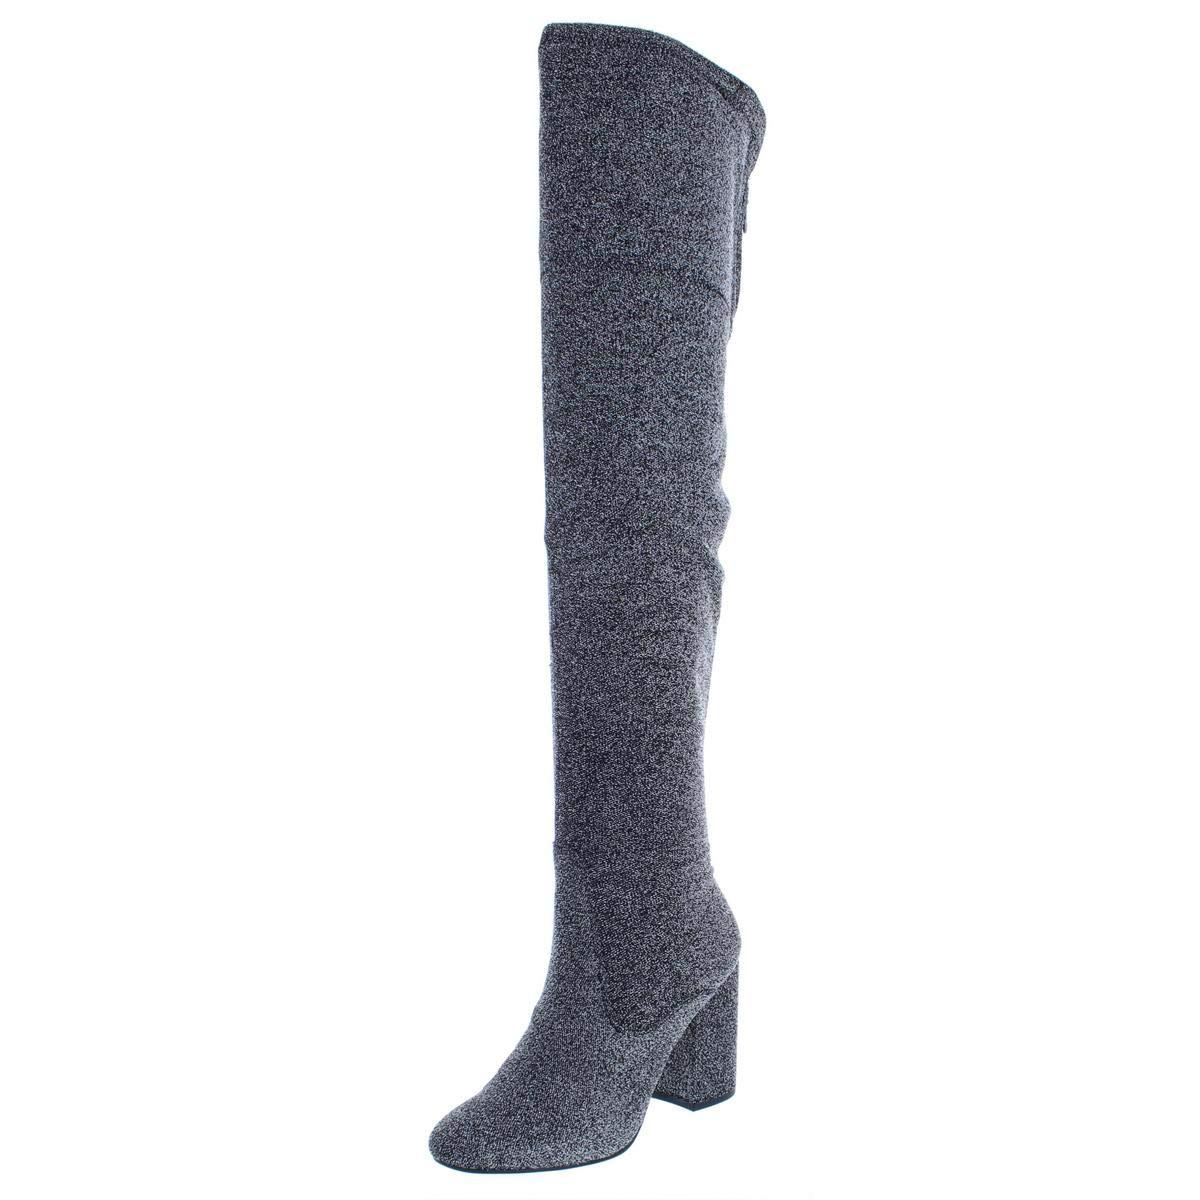 Kenneth Cole Carah New York Frauen Carah Cole Geschlossener Zeh Fashion Stiefel c310bd